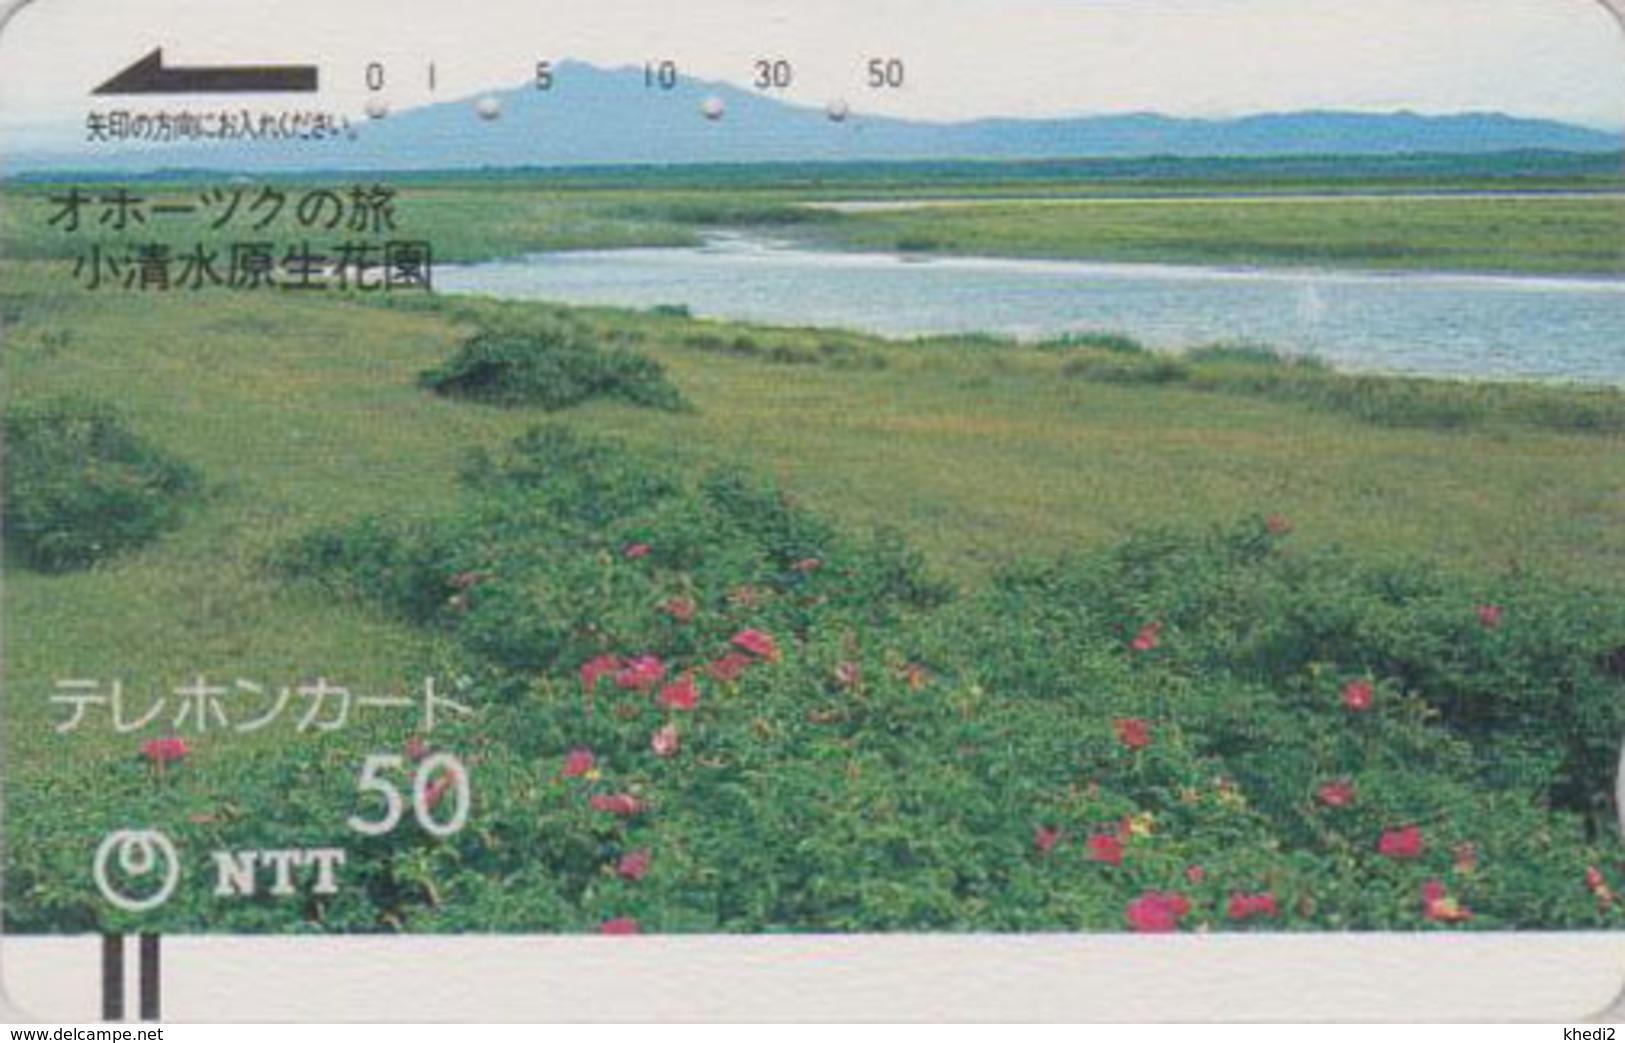 Télécarte Ancienne JAPON / NTT 430-025 - ARCTIQUE / OKHOTSK - ARCTIC  JAPAN Front Bar Phonecard / TBE - Balken TK - Japon